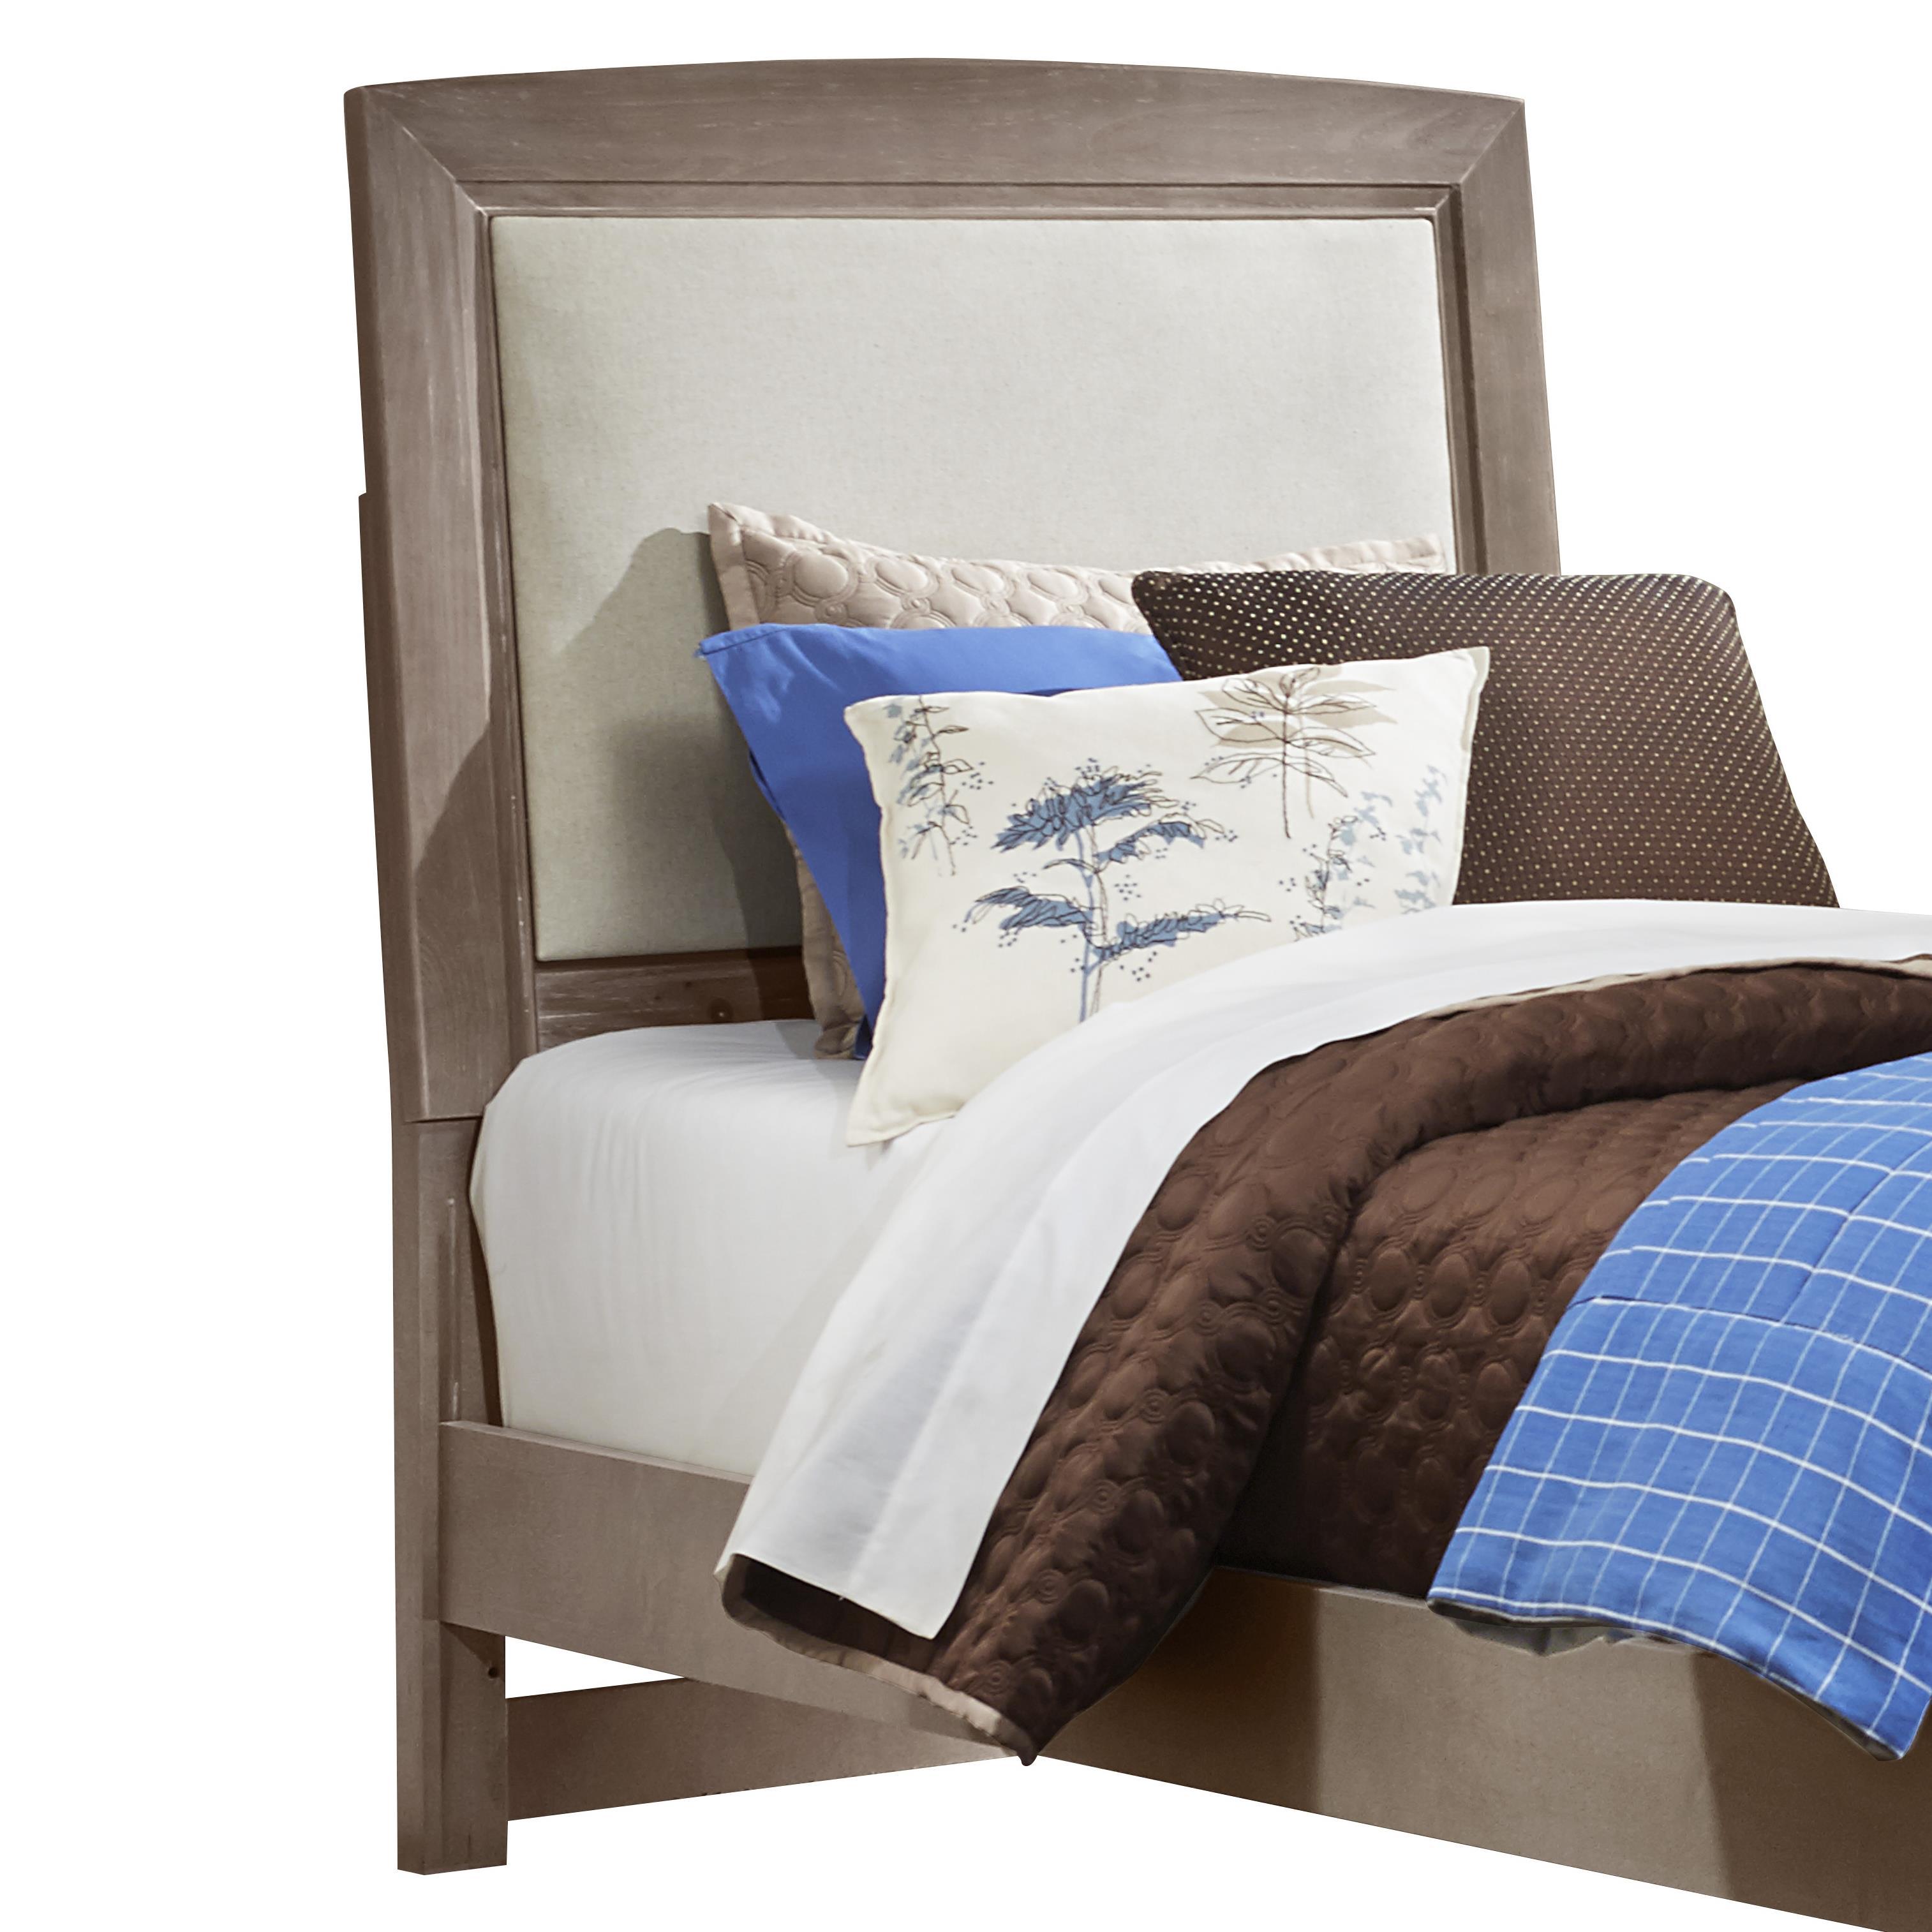 Transitions Twin Upholstered Headboard, Base Cloth Linen by Vaughan Bassett at Lapeer Furniture & Mattress Center